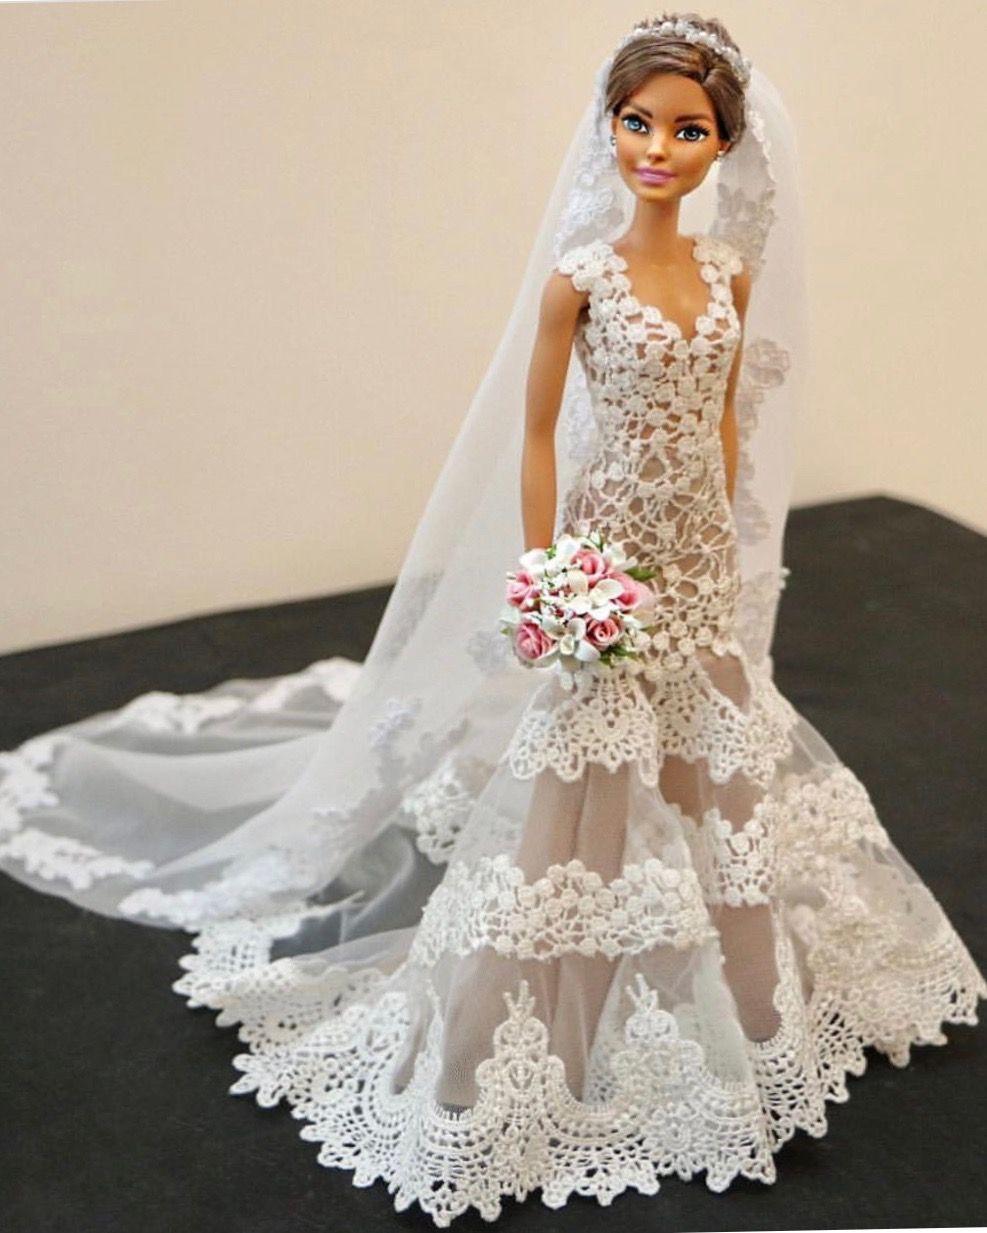 Doll wedding dress  sammurakammi  b  Barbie mariée  Pinterest  Dolls Barbie